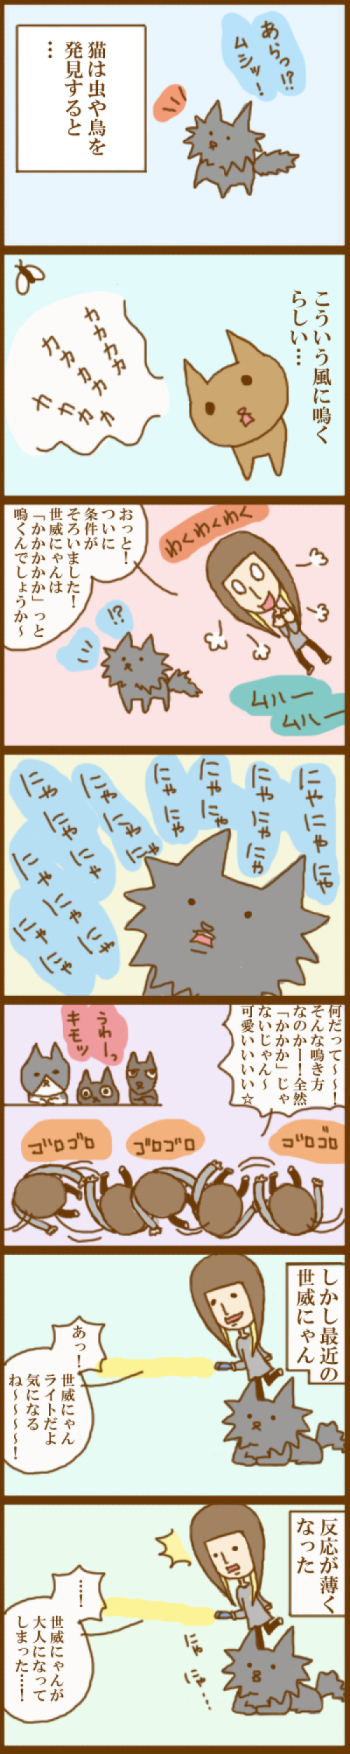 f:id:suzuokayu:20201117094322j:plain